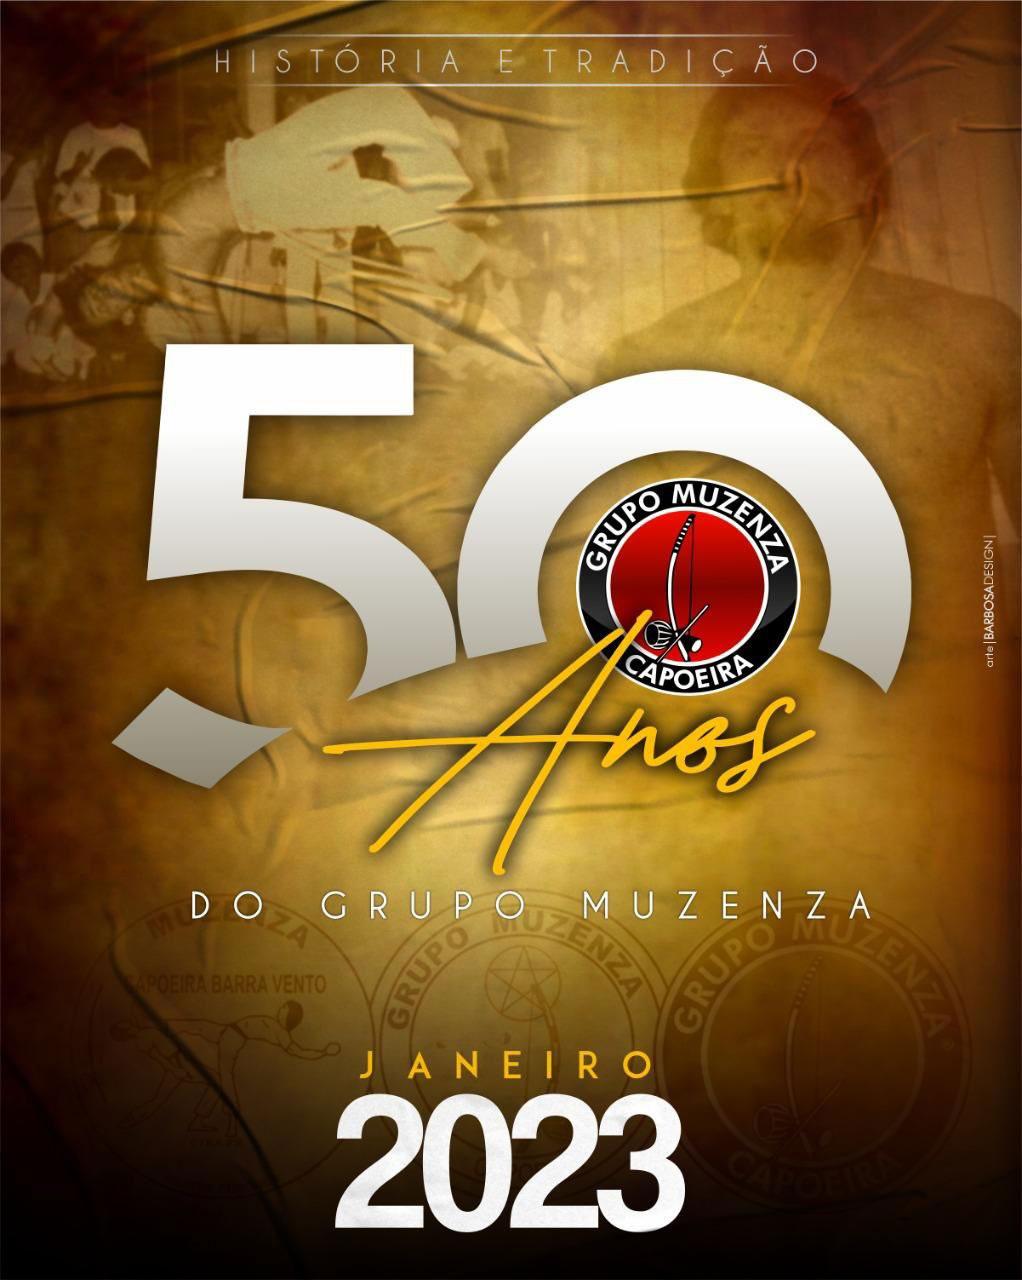 50 Anos do Grupo Muzenza